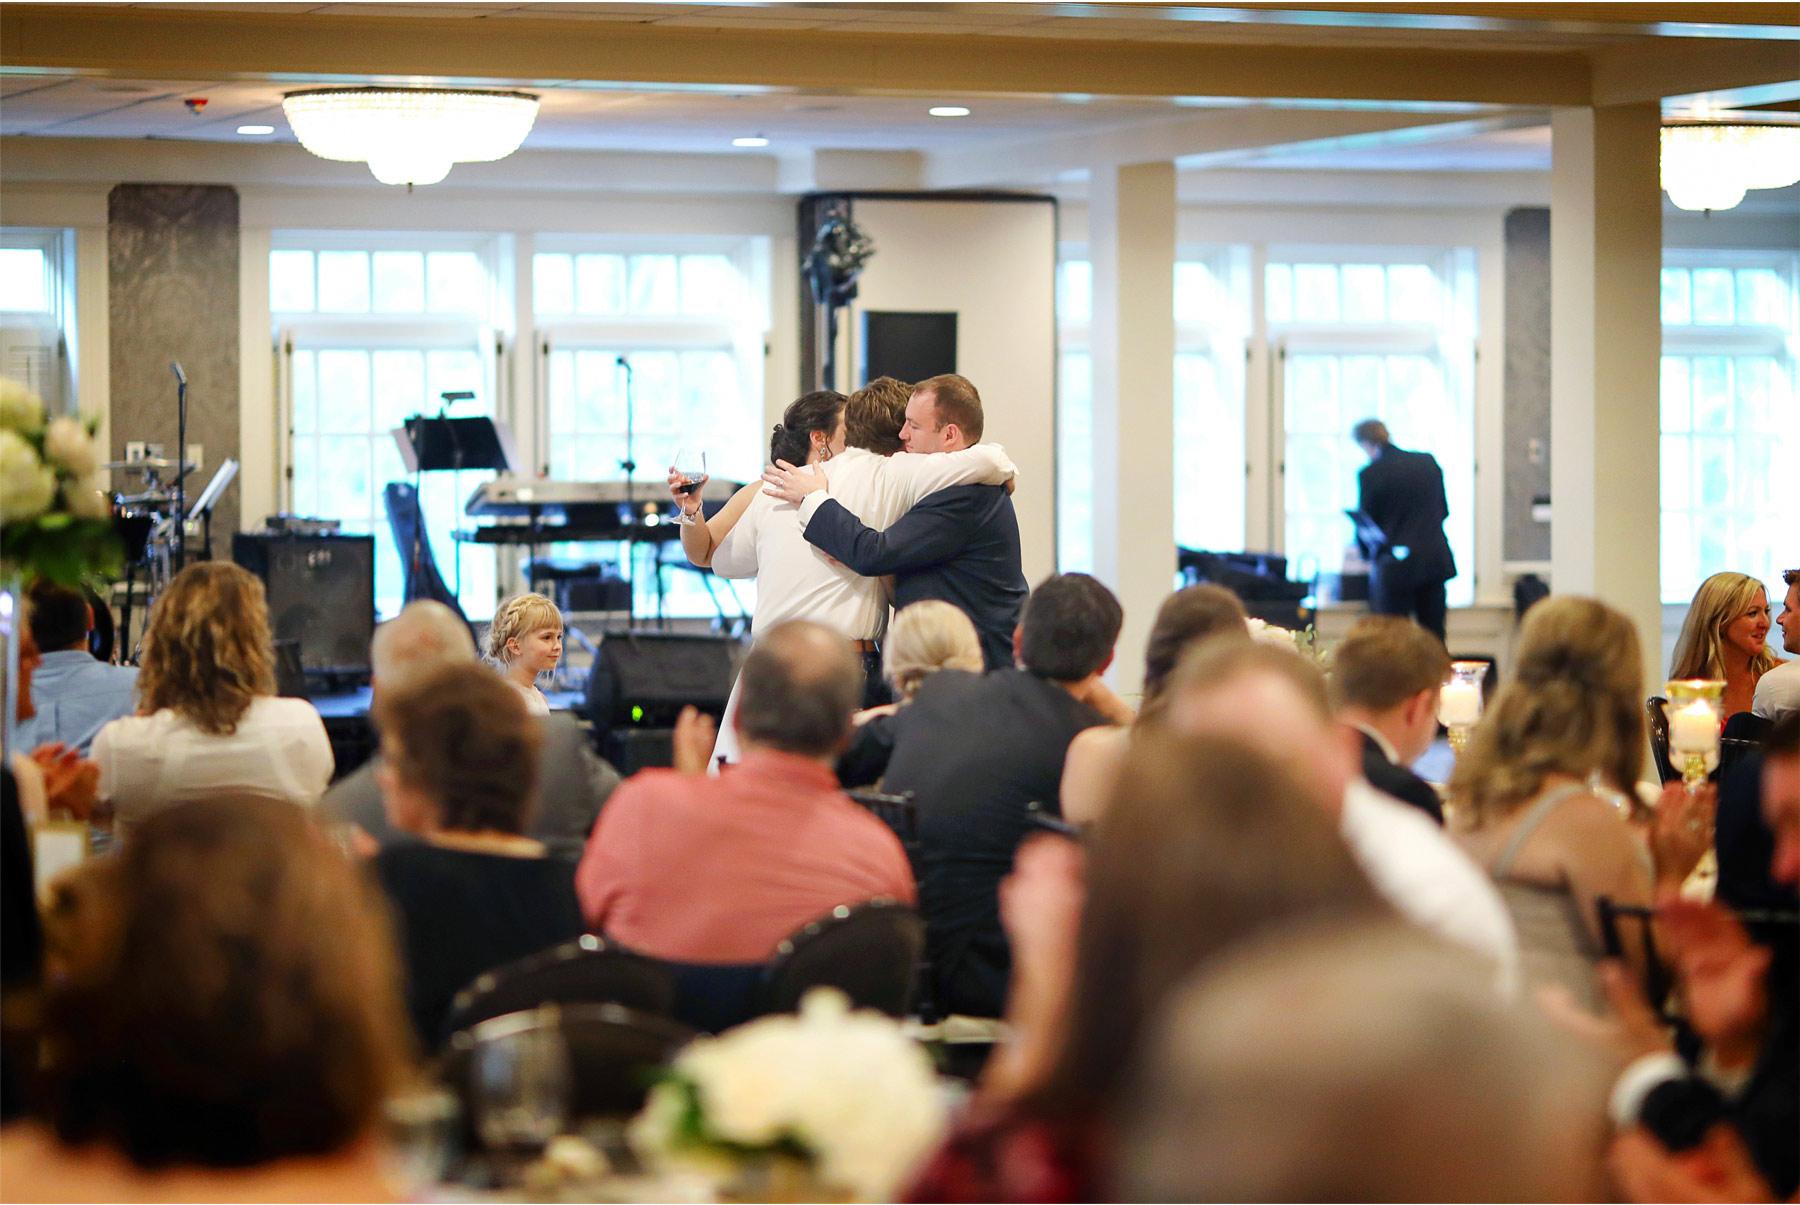 18-Vick-Photography-Wedding-Minneapolis-Minnesota-Edina-Country-Club-Reception-Toast-Erin-and-David.jpg